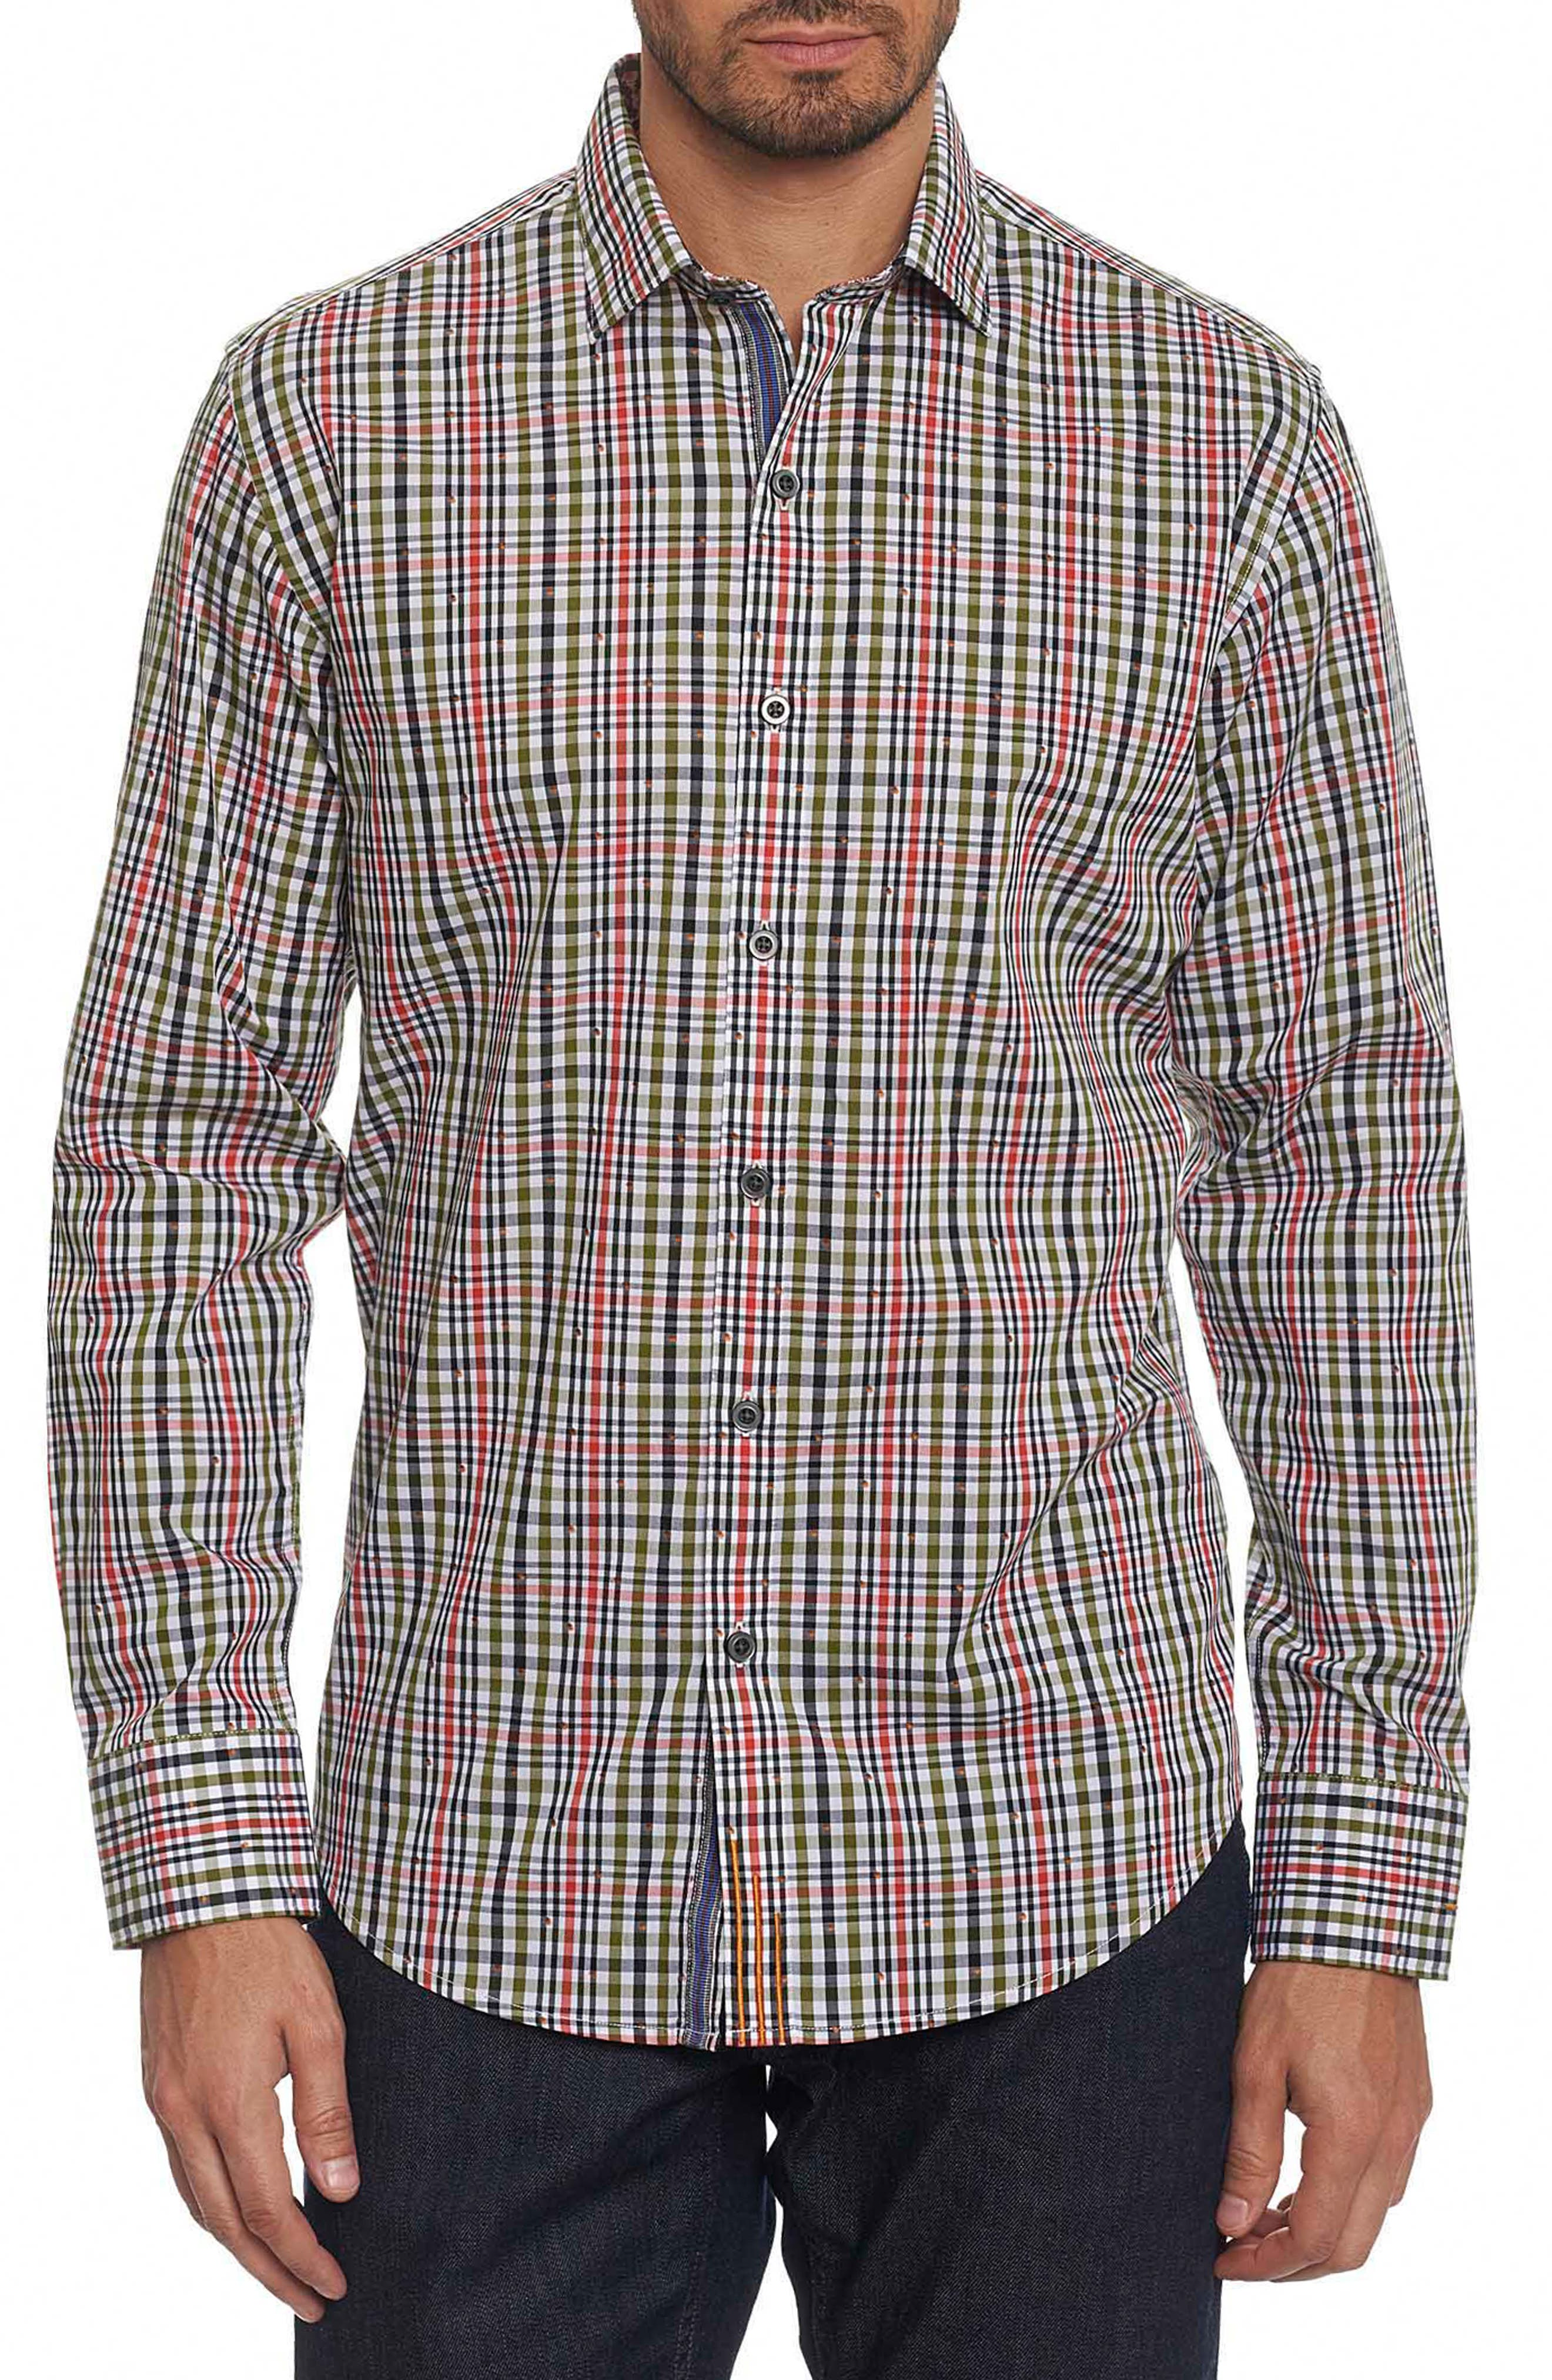 ROBERT GRAHAM Cape Vincent Classic Fit Dobby Check Sport Shirt, Main, color, 308